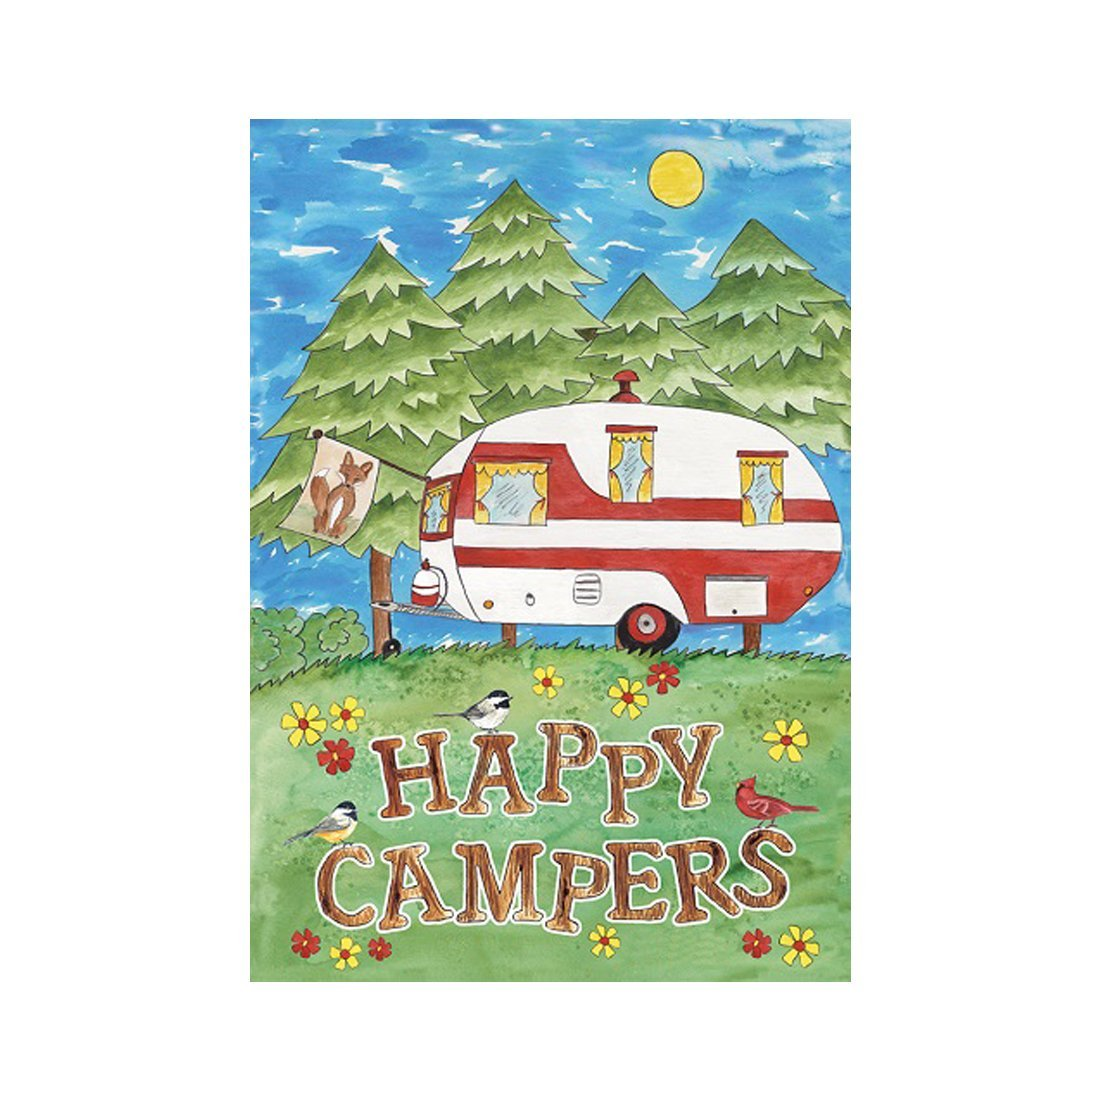 Amazon.com : Accent Flag Camping Fun Garden flags decorative flags ...